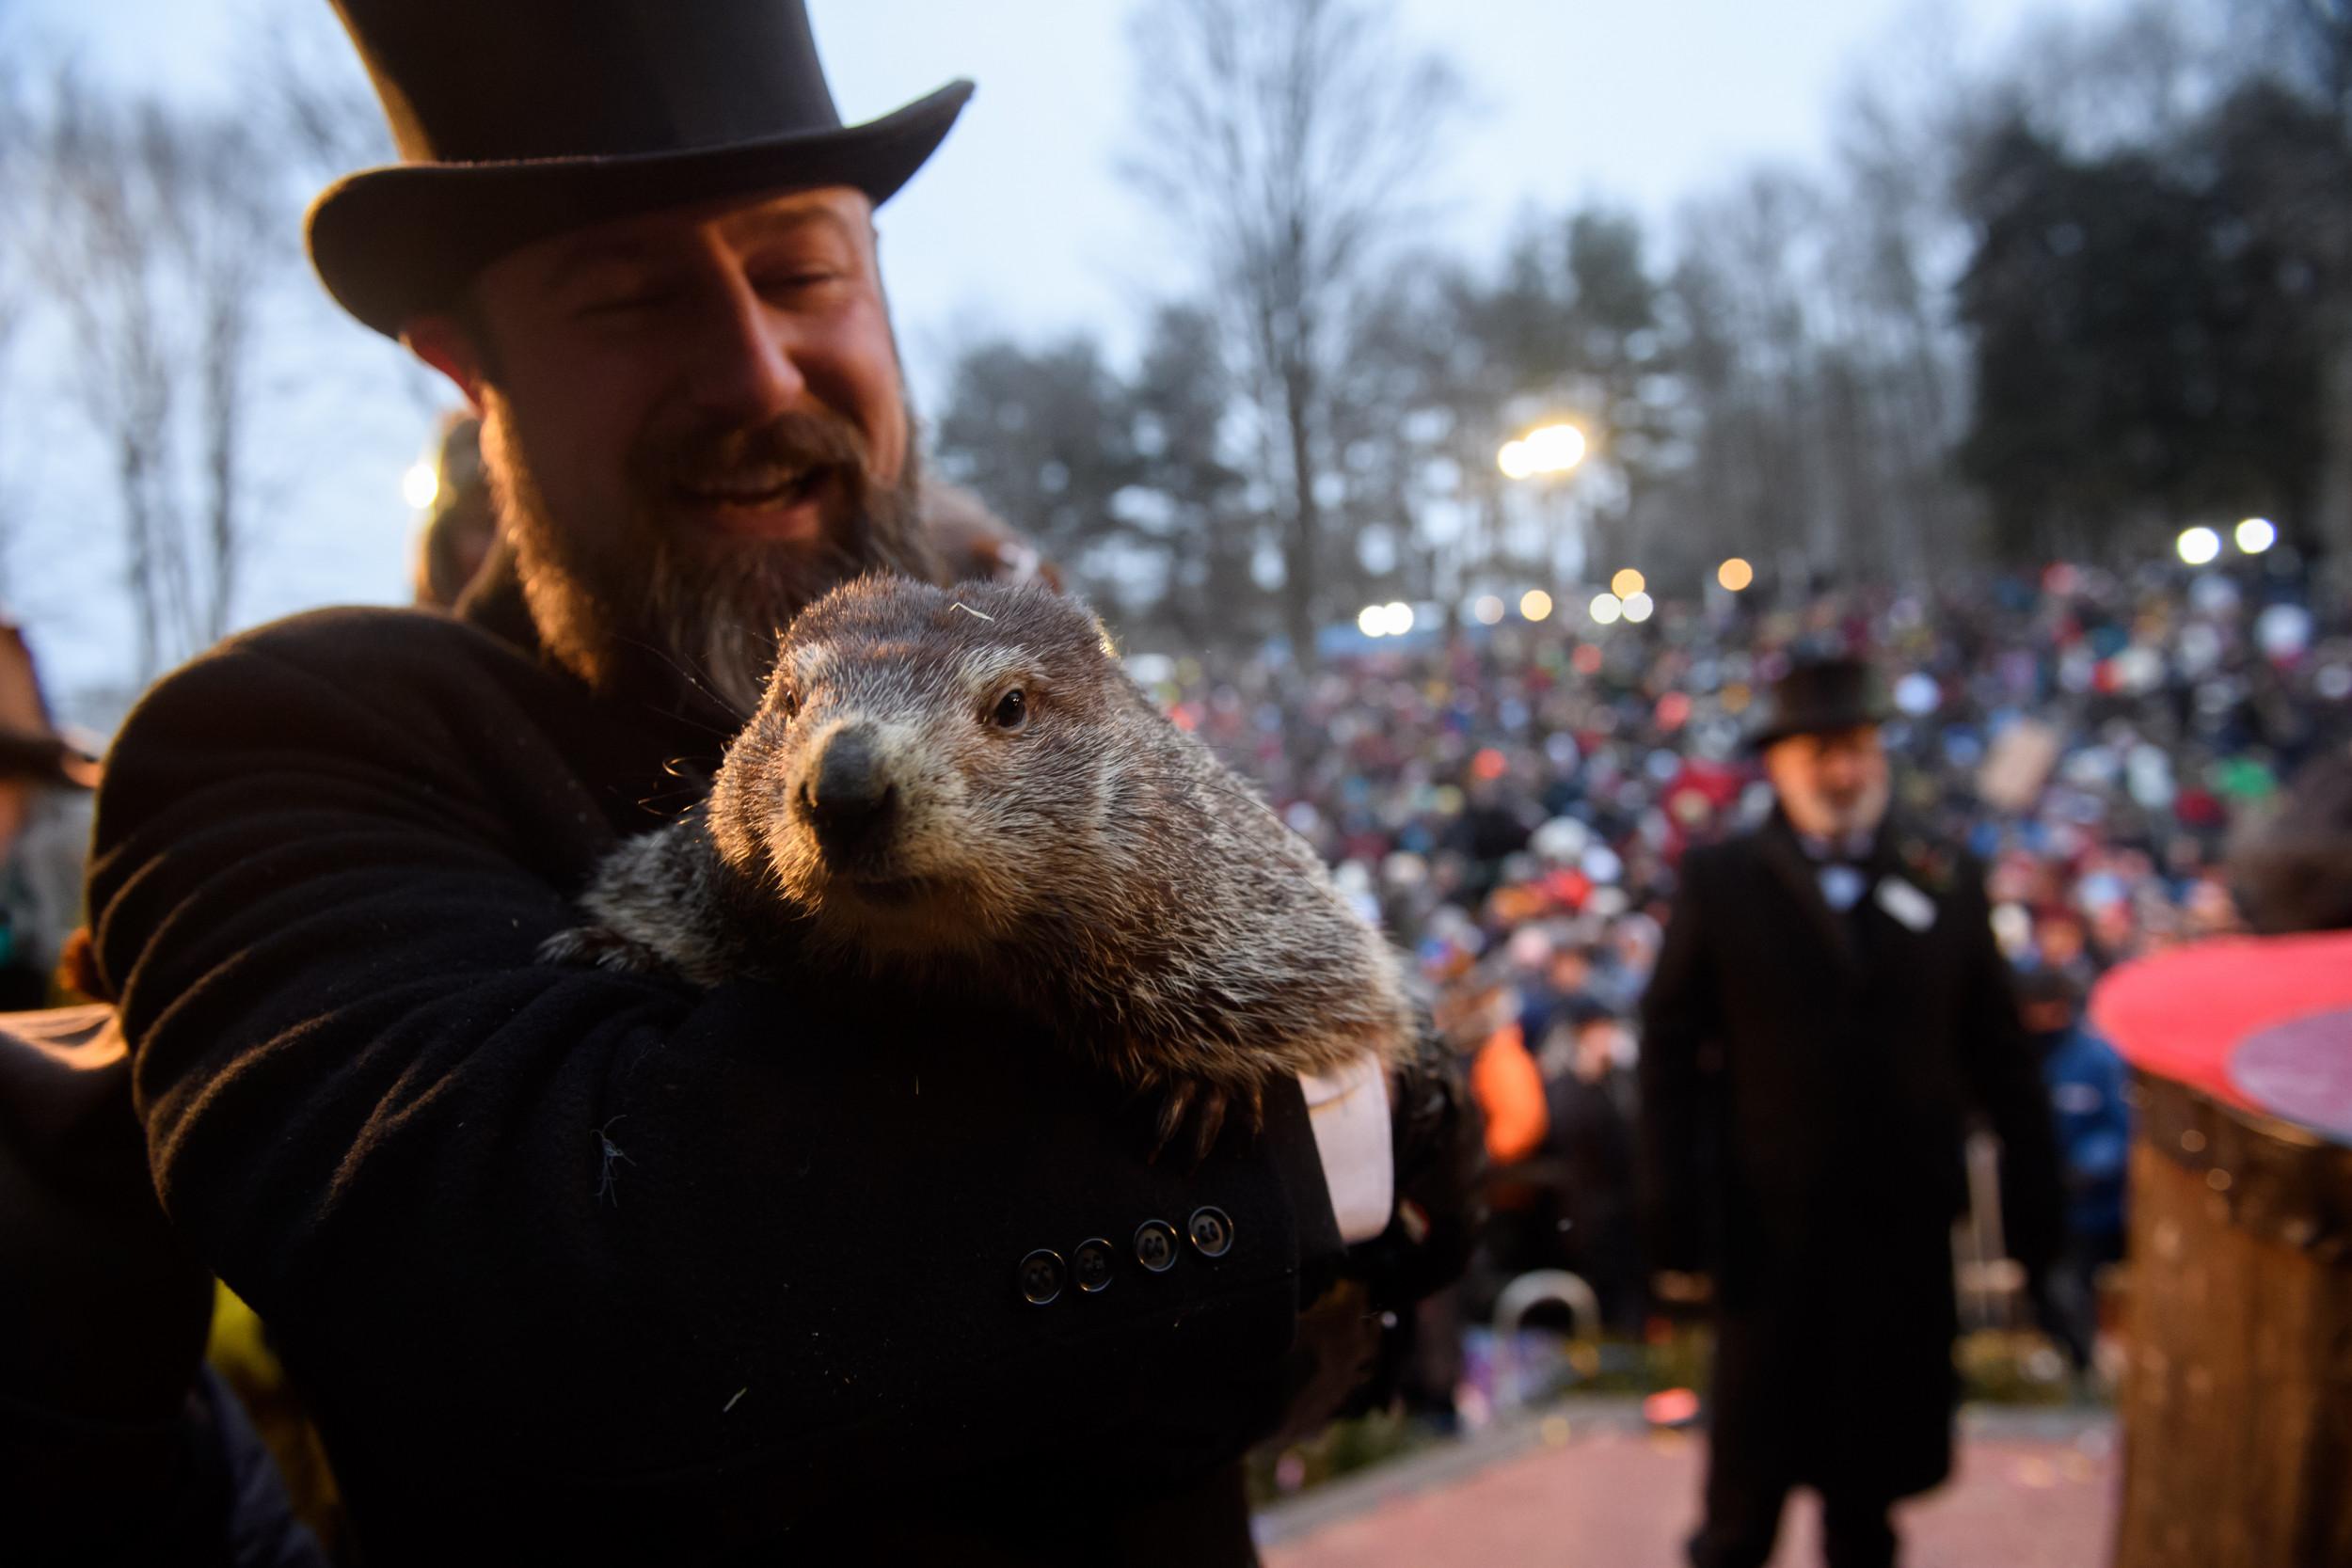 Groundhog Day Livestream Watch Punxsutawney Phil